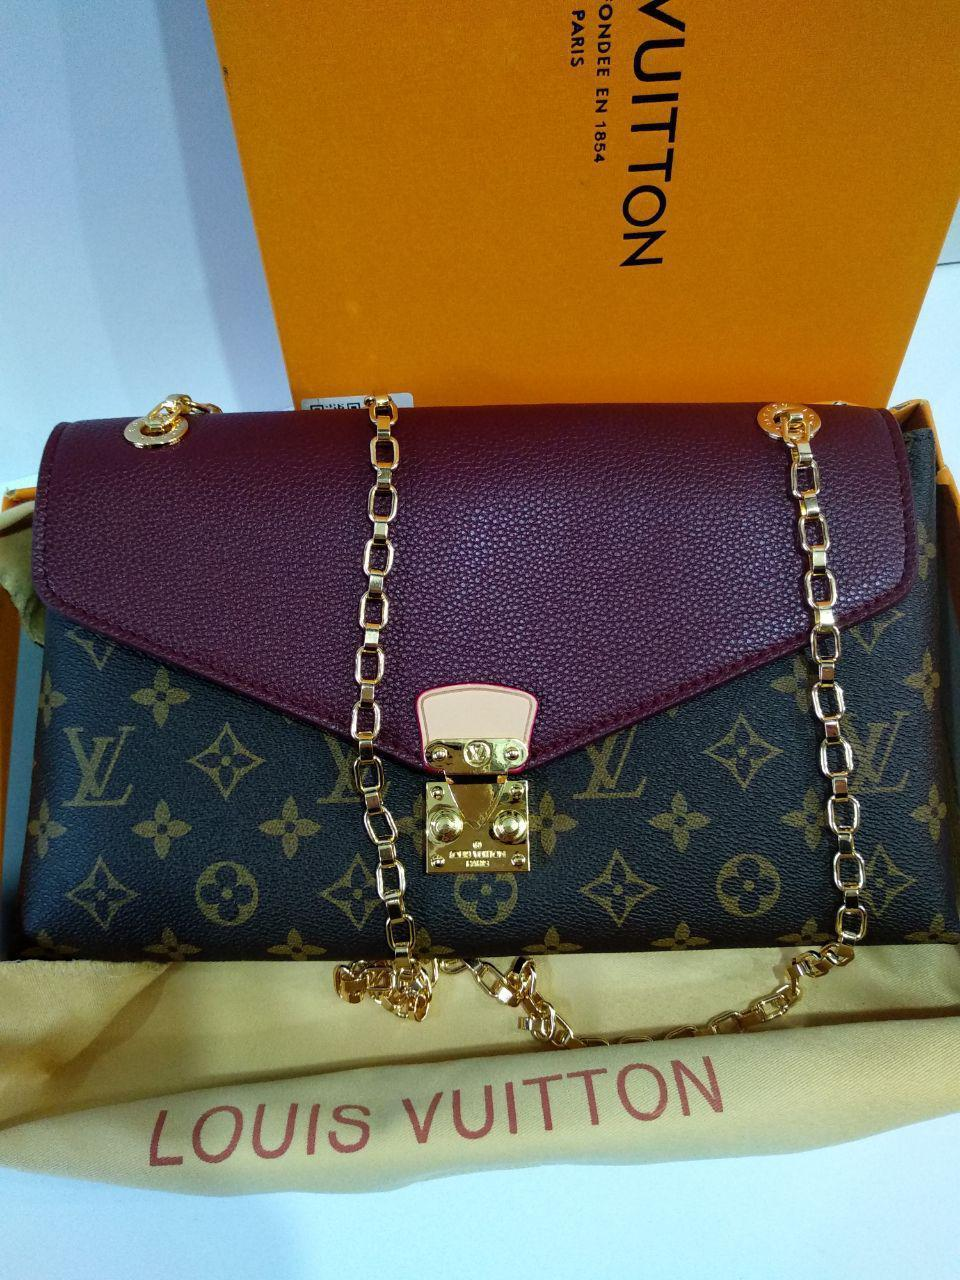 Женская Кожаная Сумка в Стиле Louis Vuitton Луи Виттон — в Категории ... a0e41c1253f78